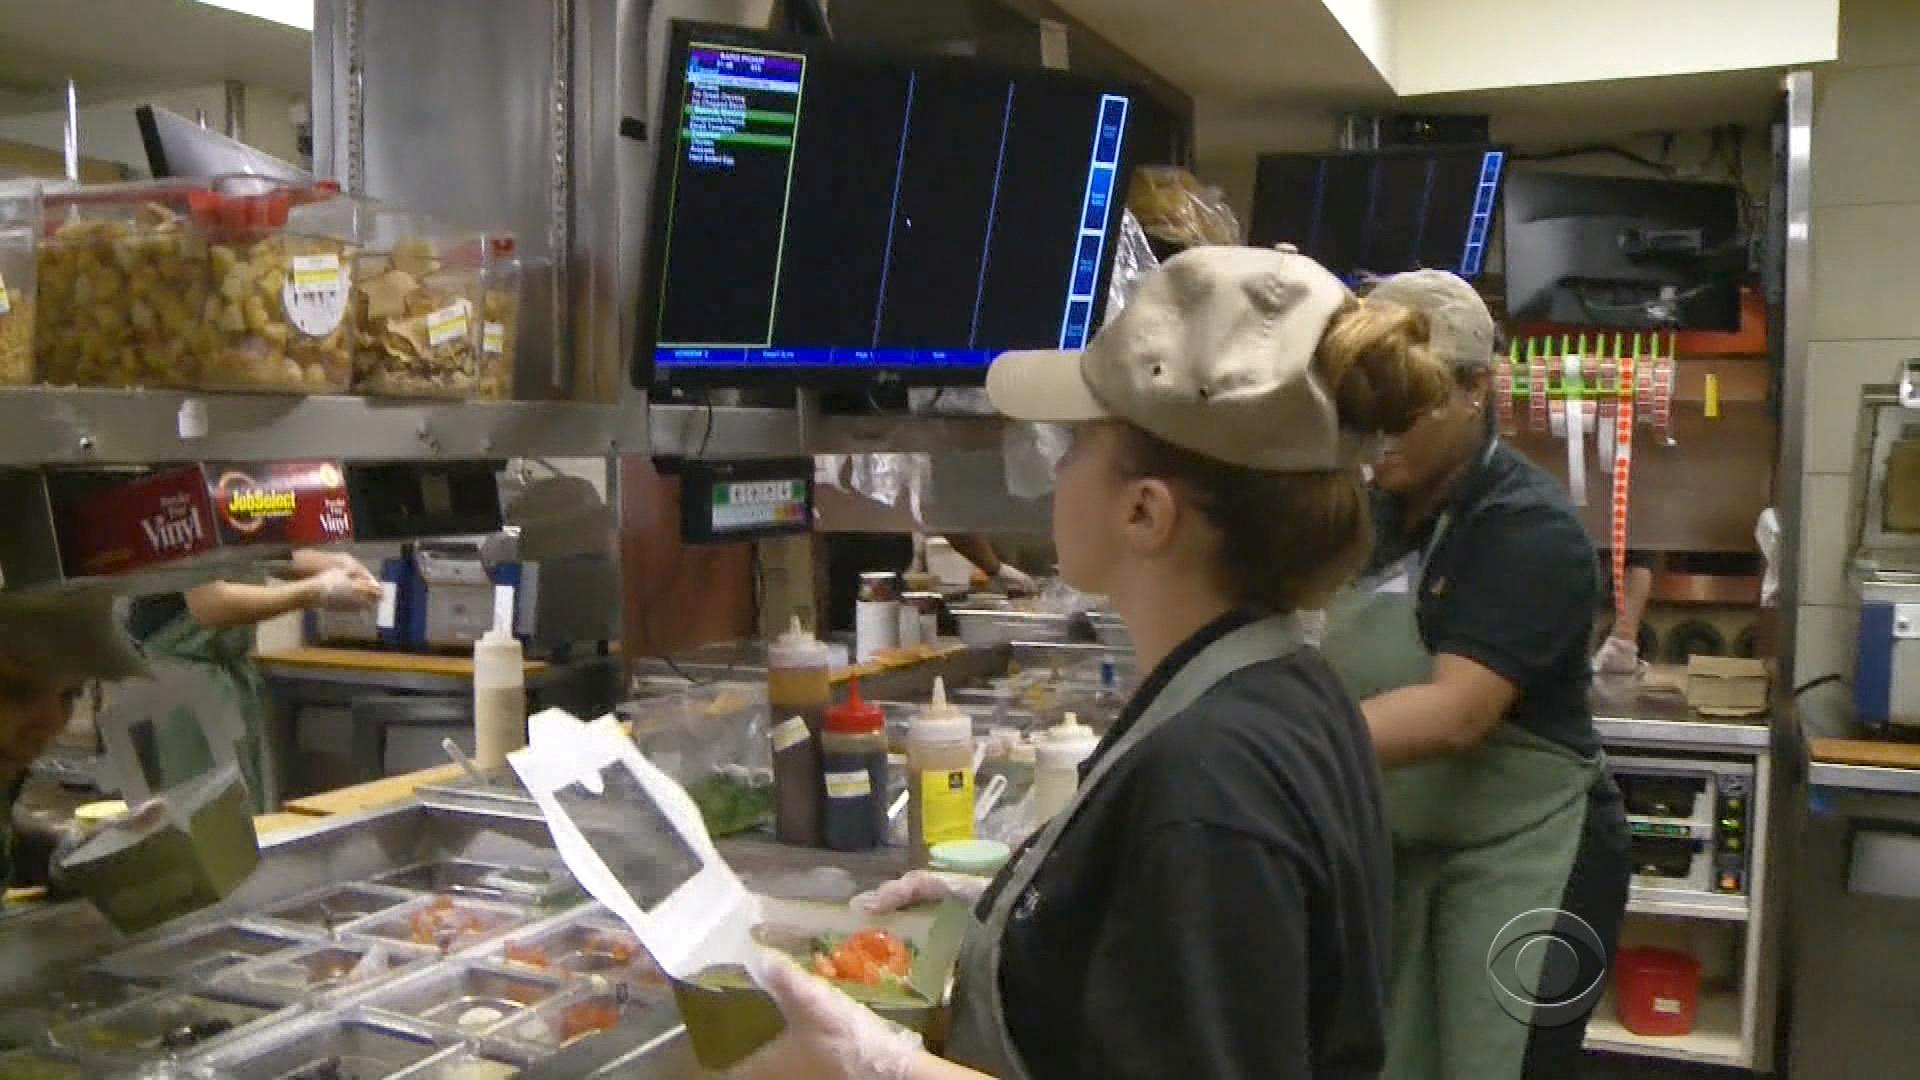 Debate over minimum wage increase heats up